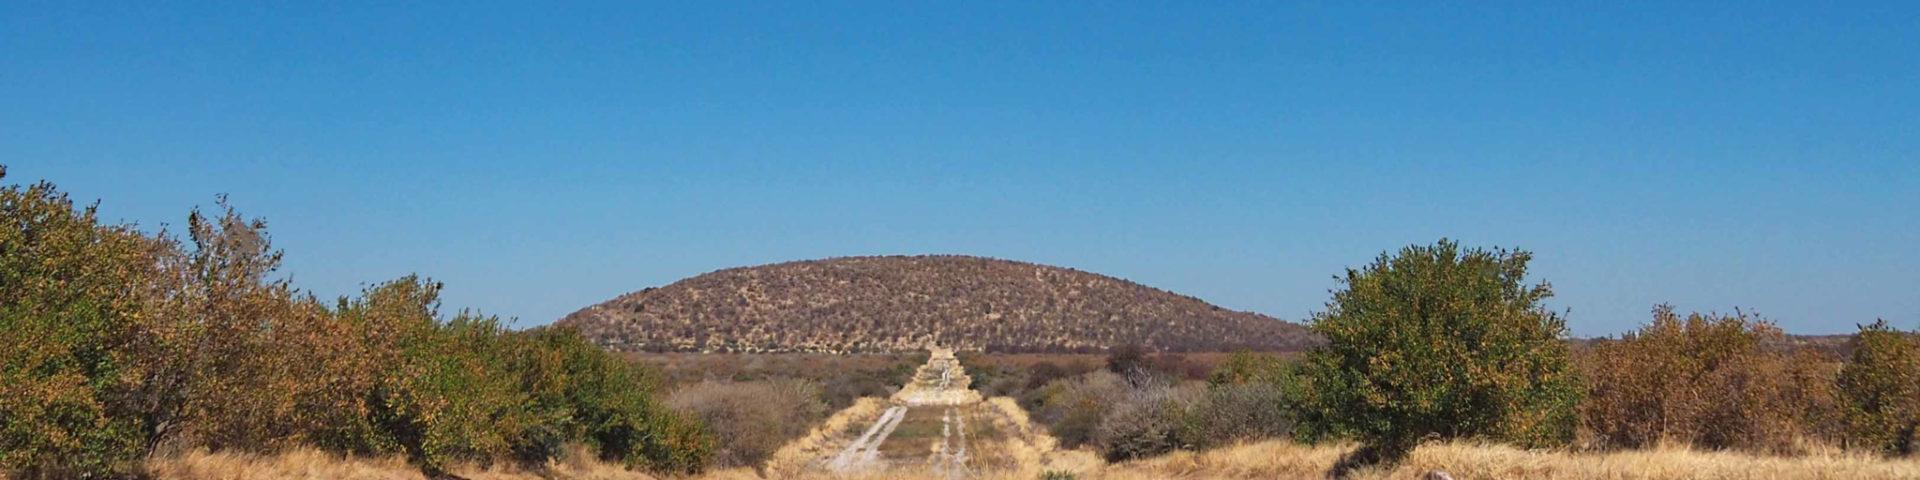 Weltreise 2021 Botswana Central Kalahari Game Reserve Tsau Hills